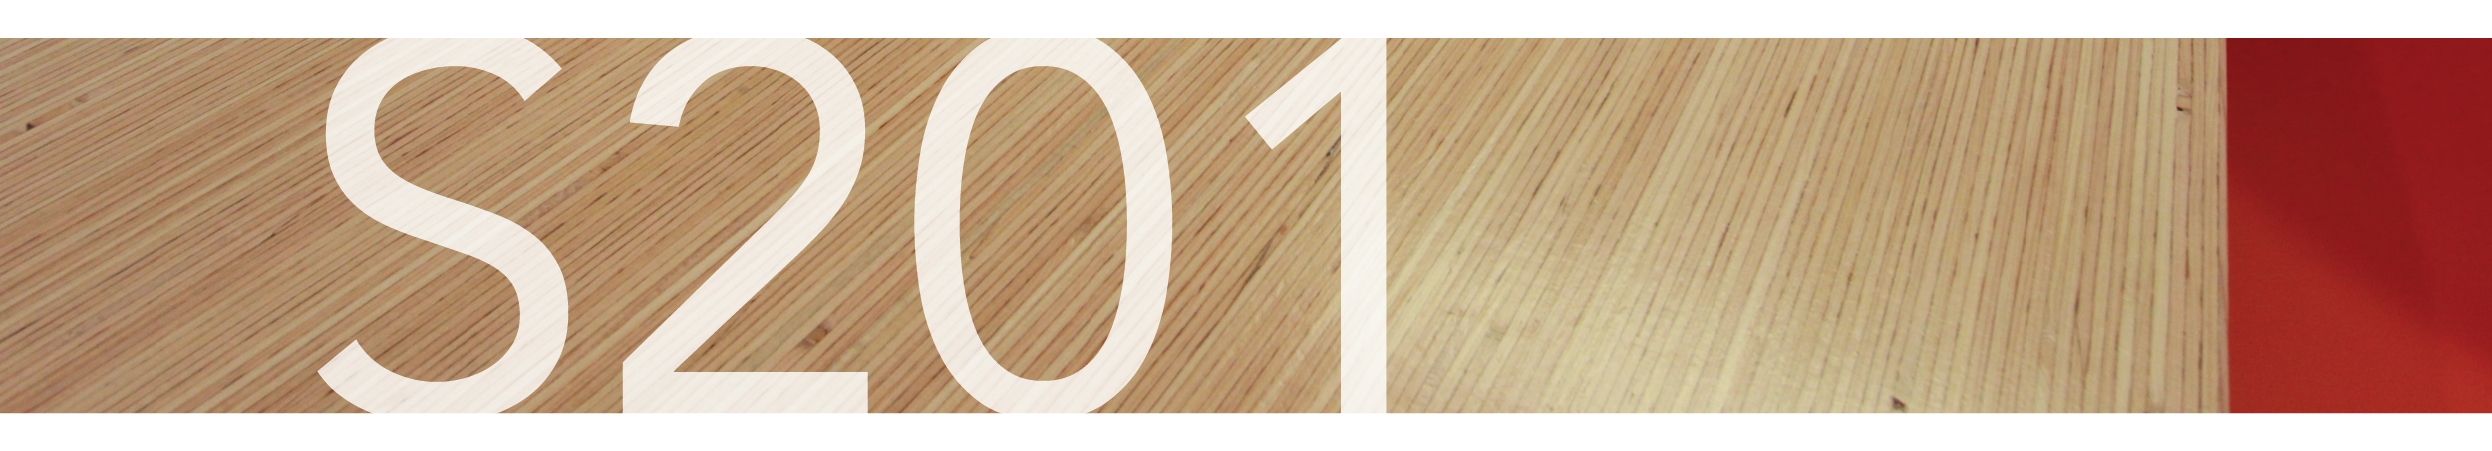 Project Tiles-05.jpg